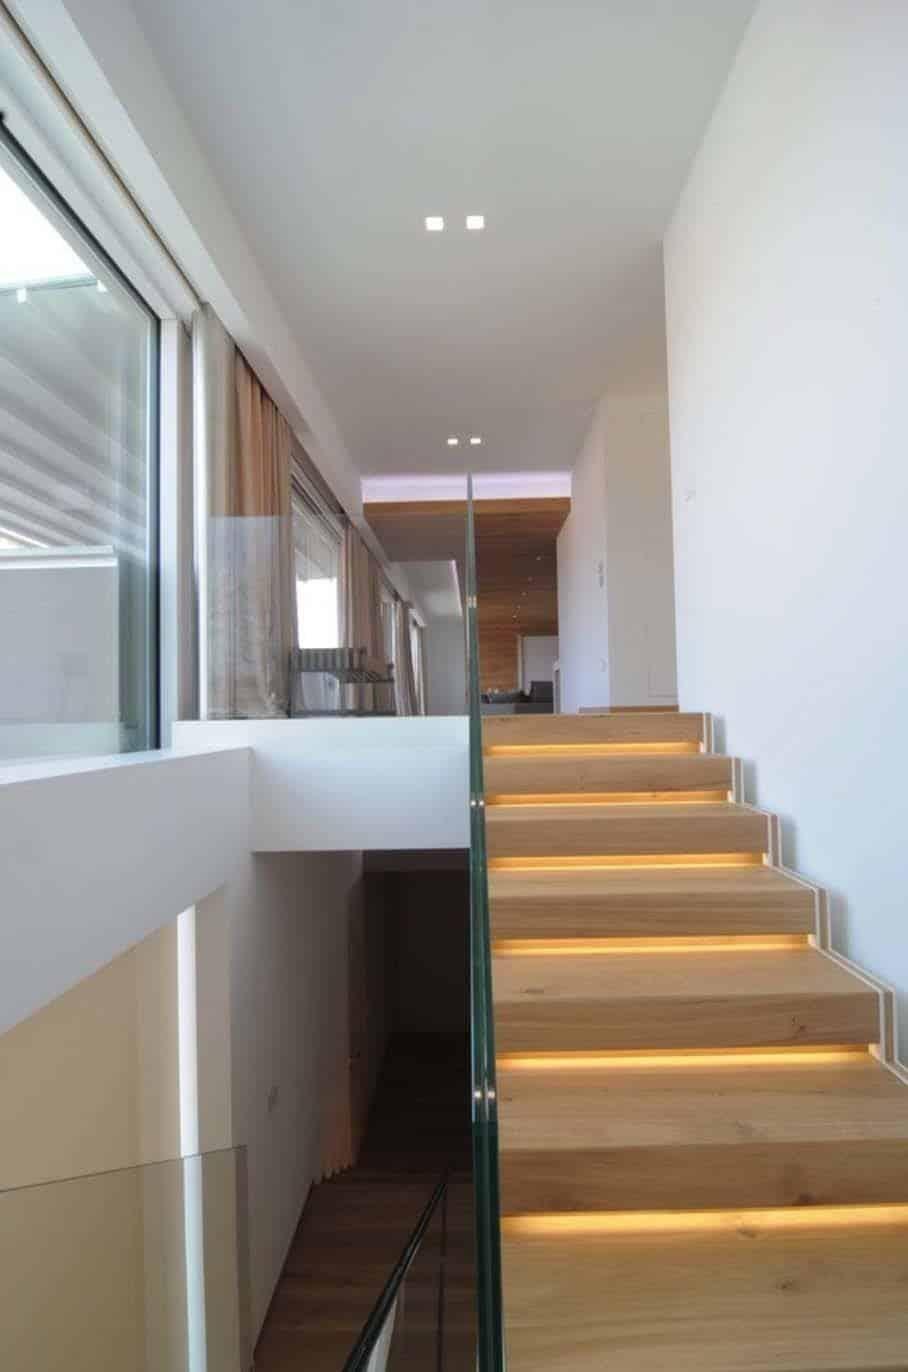 Luxury Home Interior-STIMAMIGLIO-13-1 Kindesign